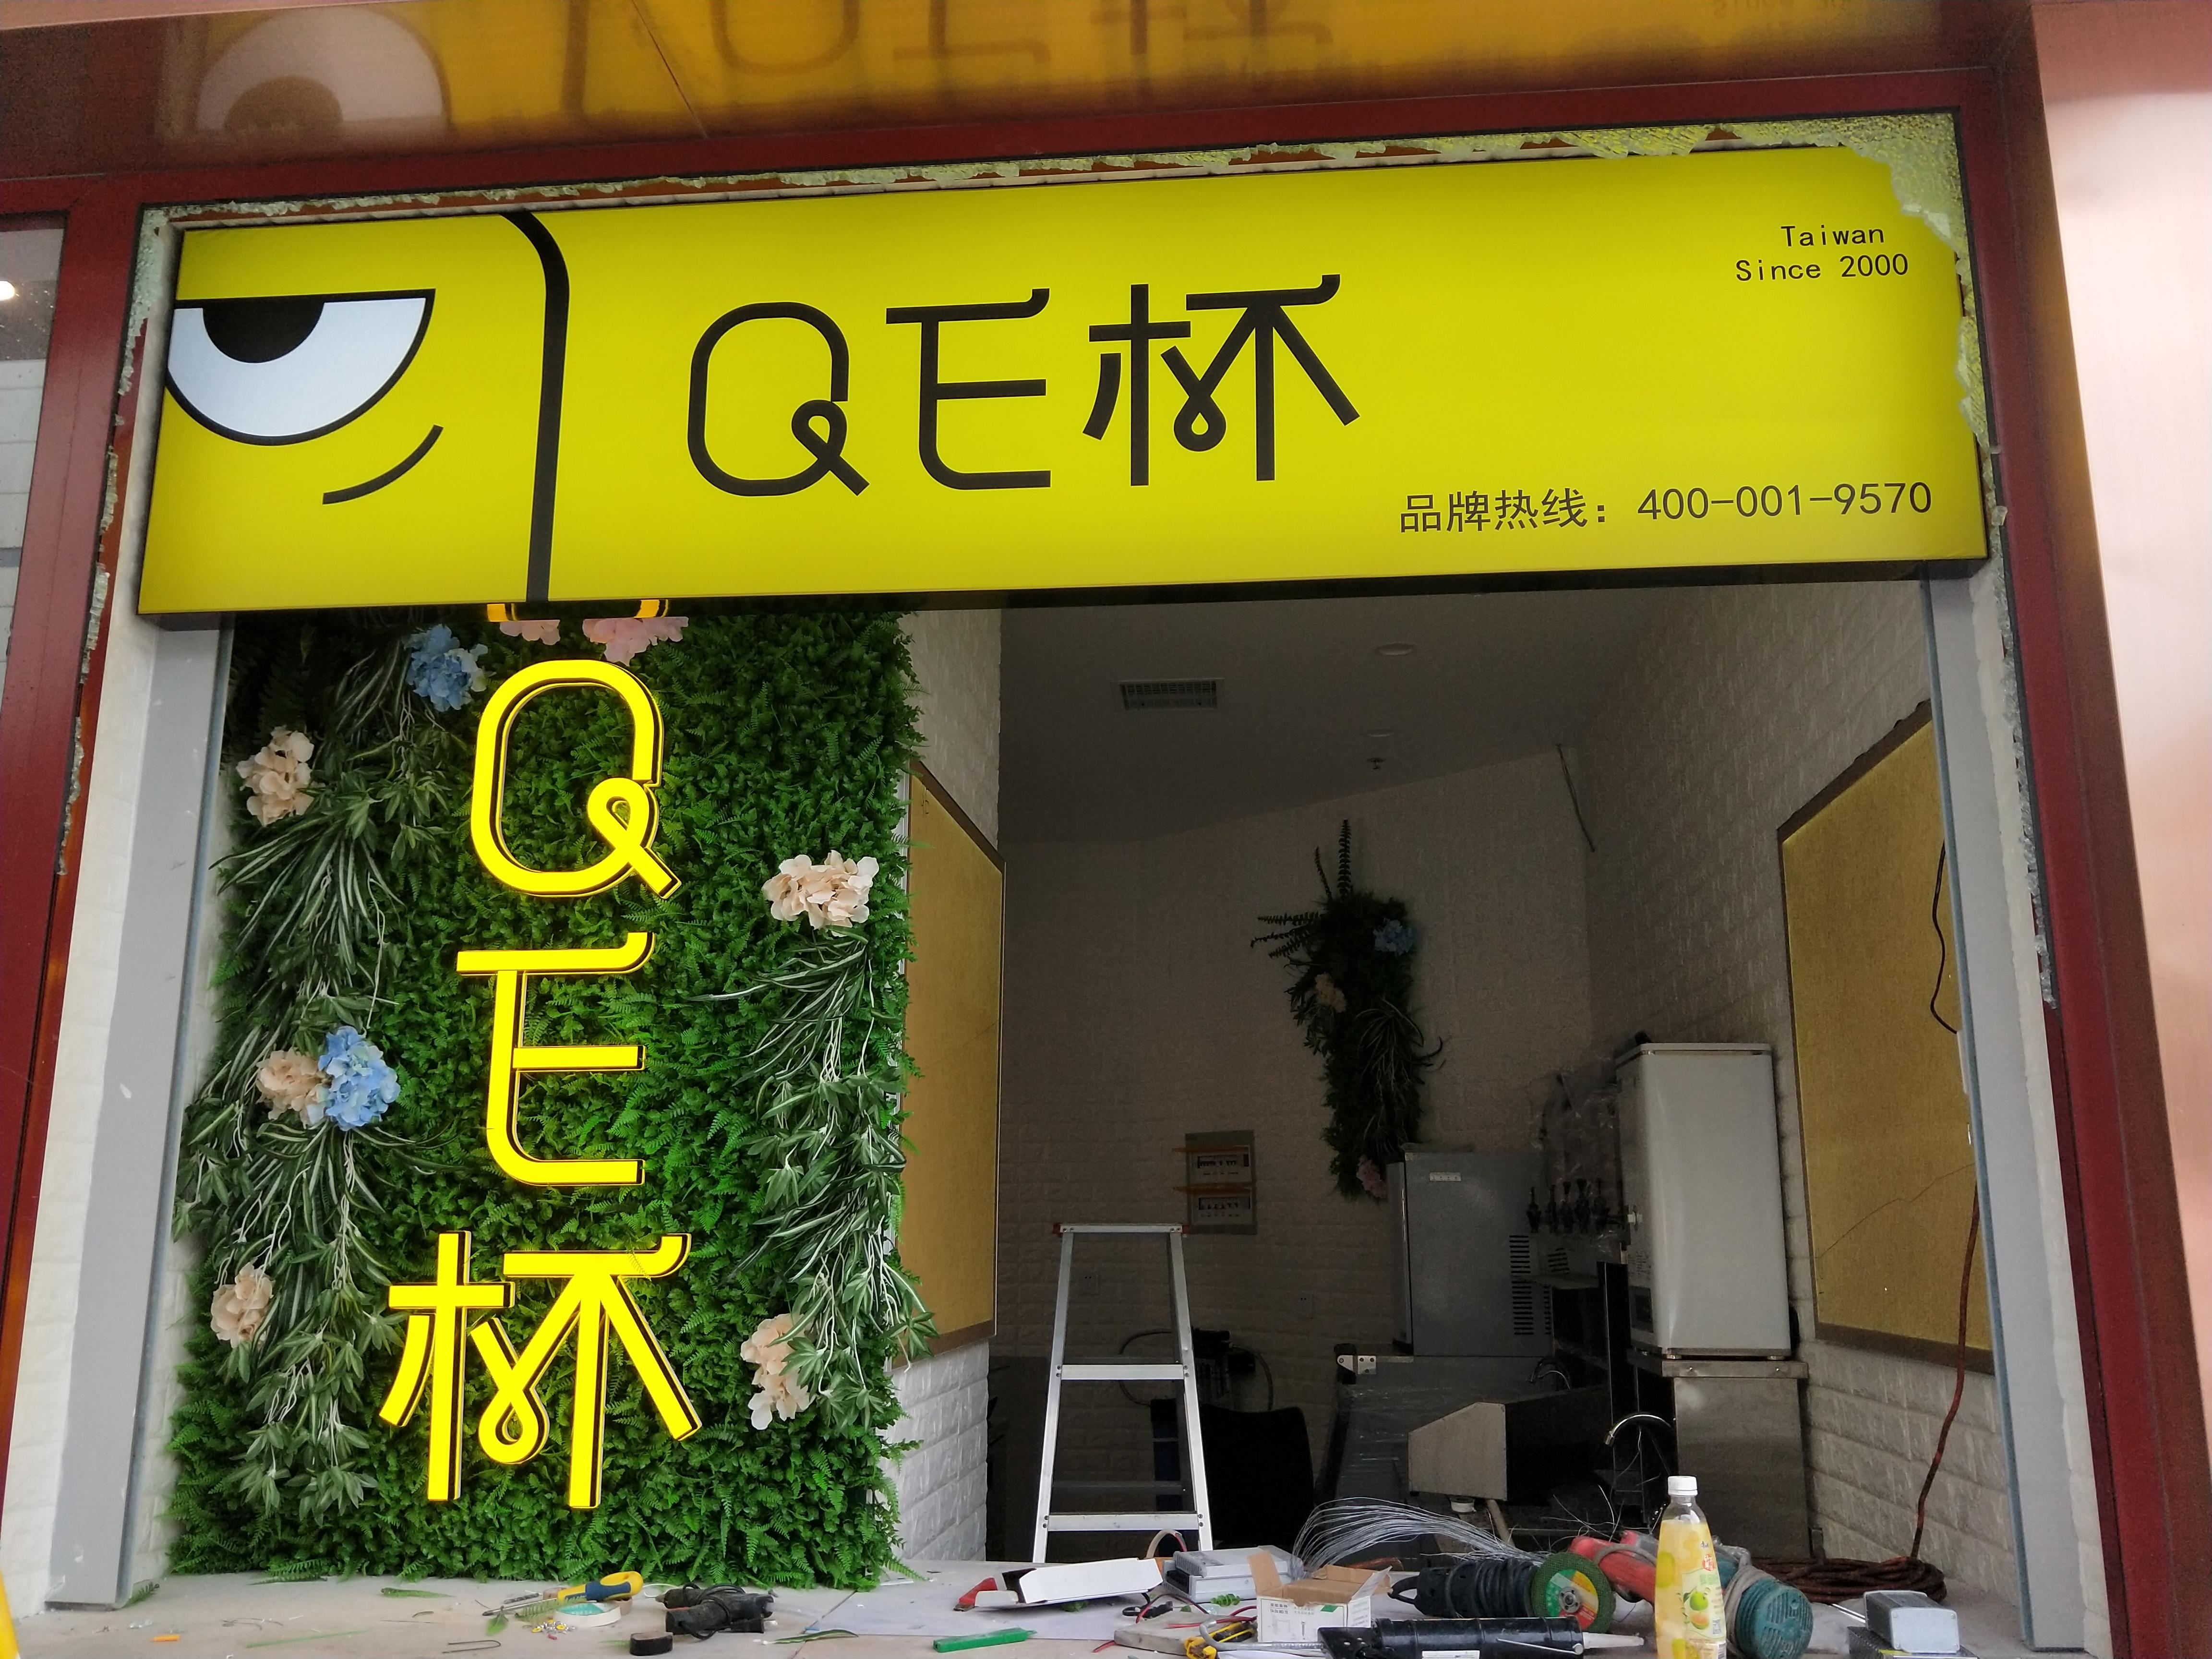 QE杯奶茶店形象